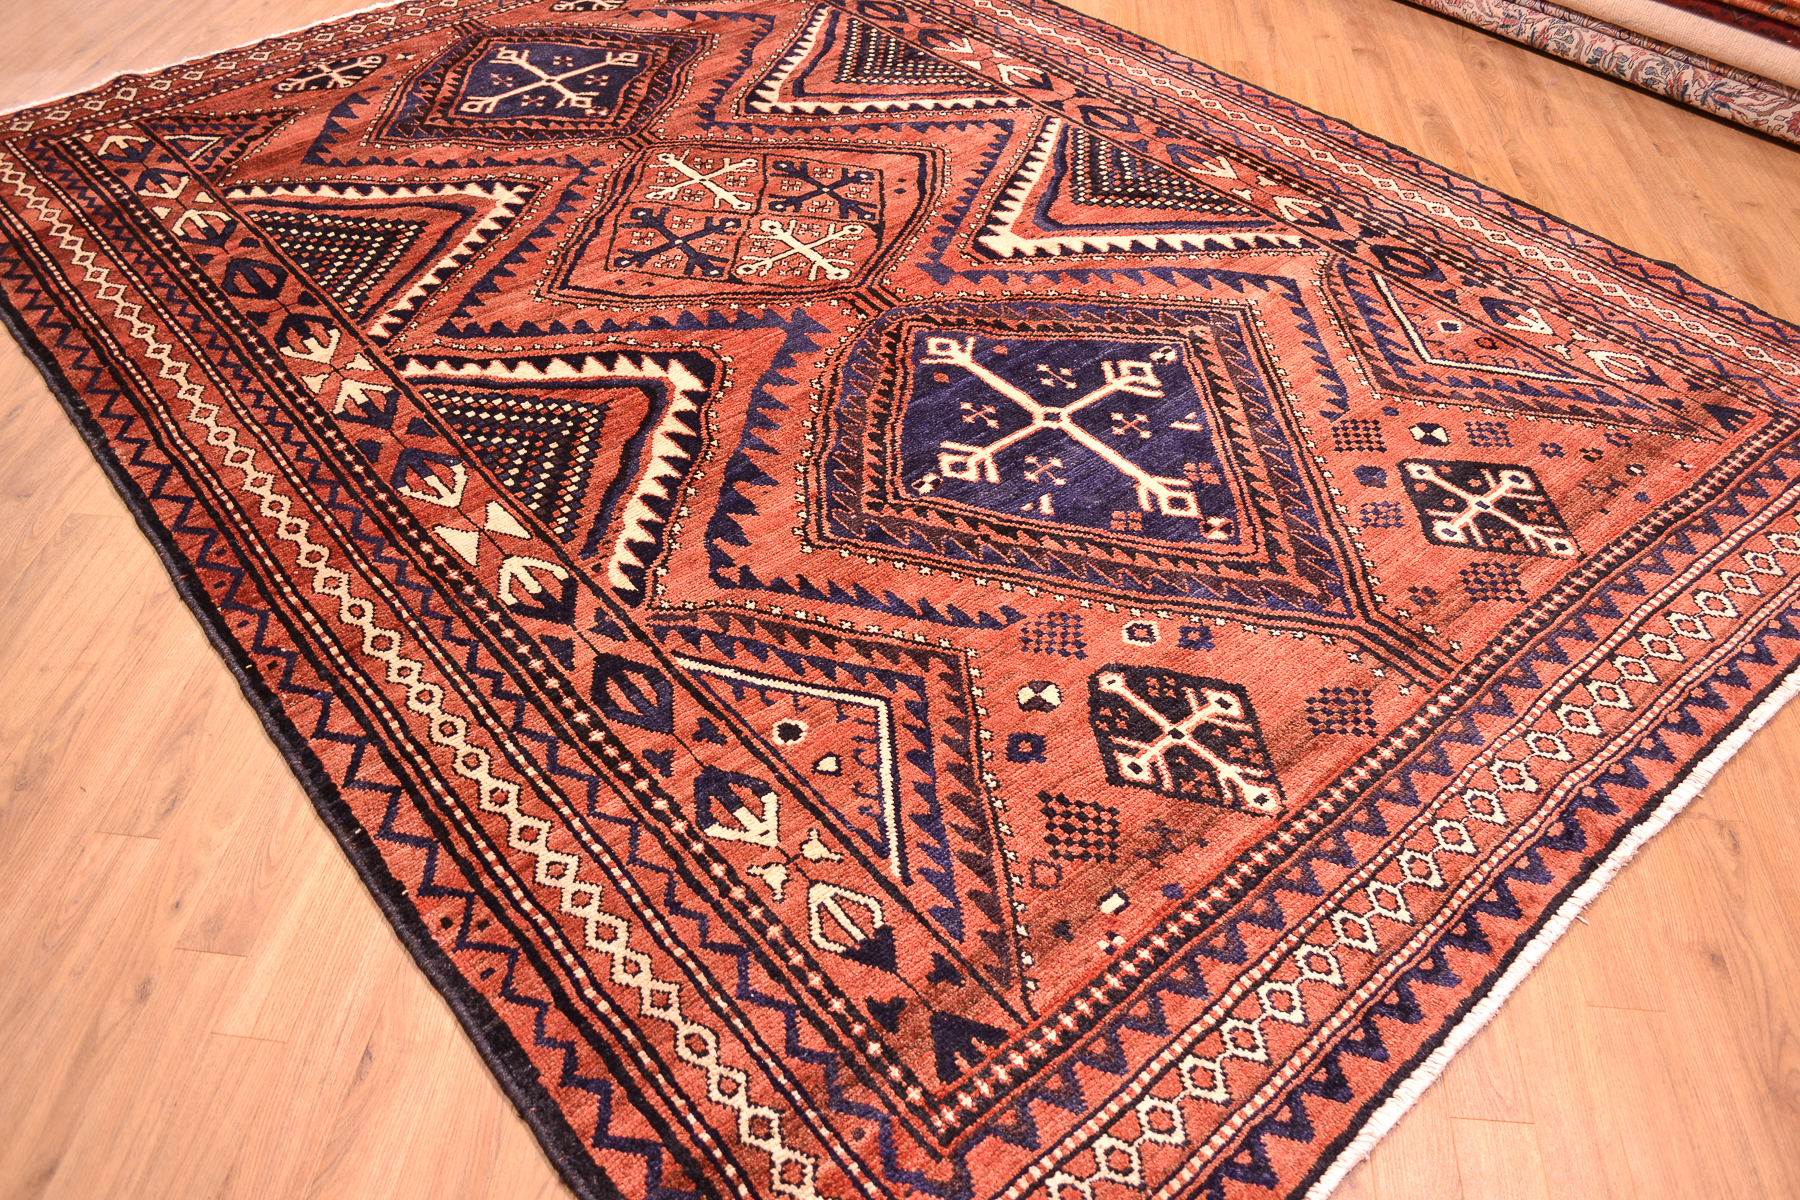 Persian Luri Carpet 3 05x2 25m The Oriental Rug Merchant